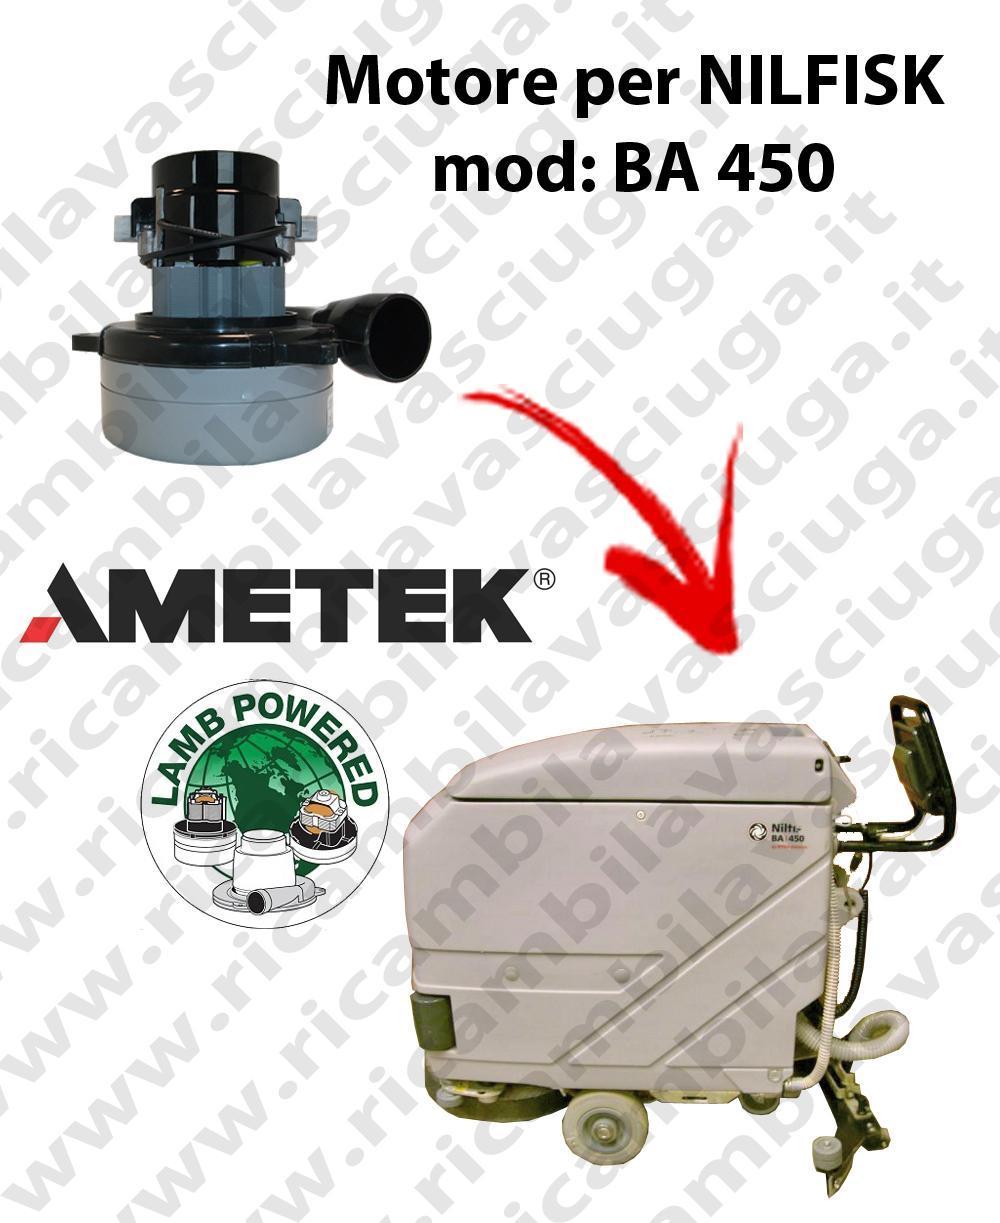 BA 450 Saugmotor LAMB AMETEK für scheuersaugmaschinen NILFISK